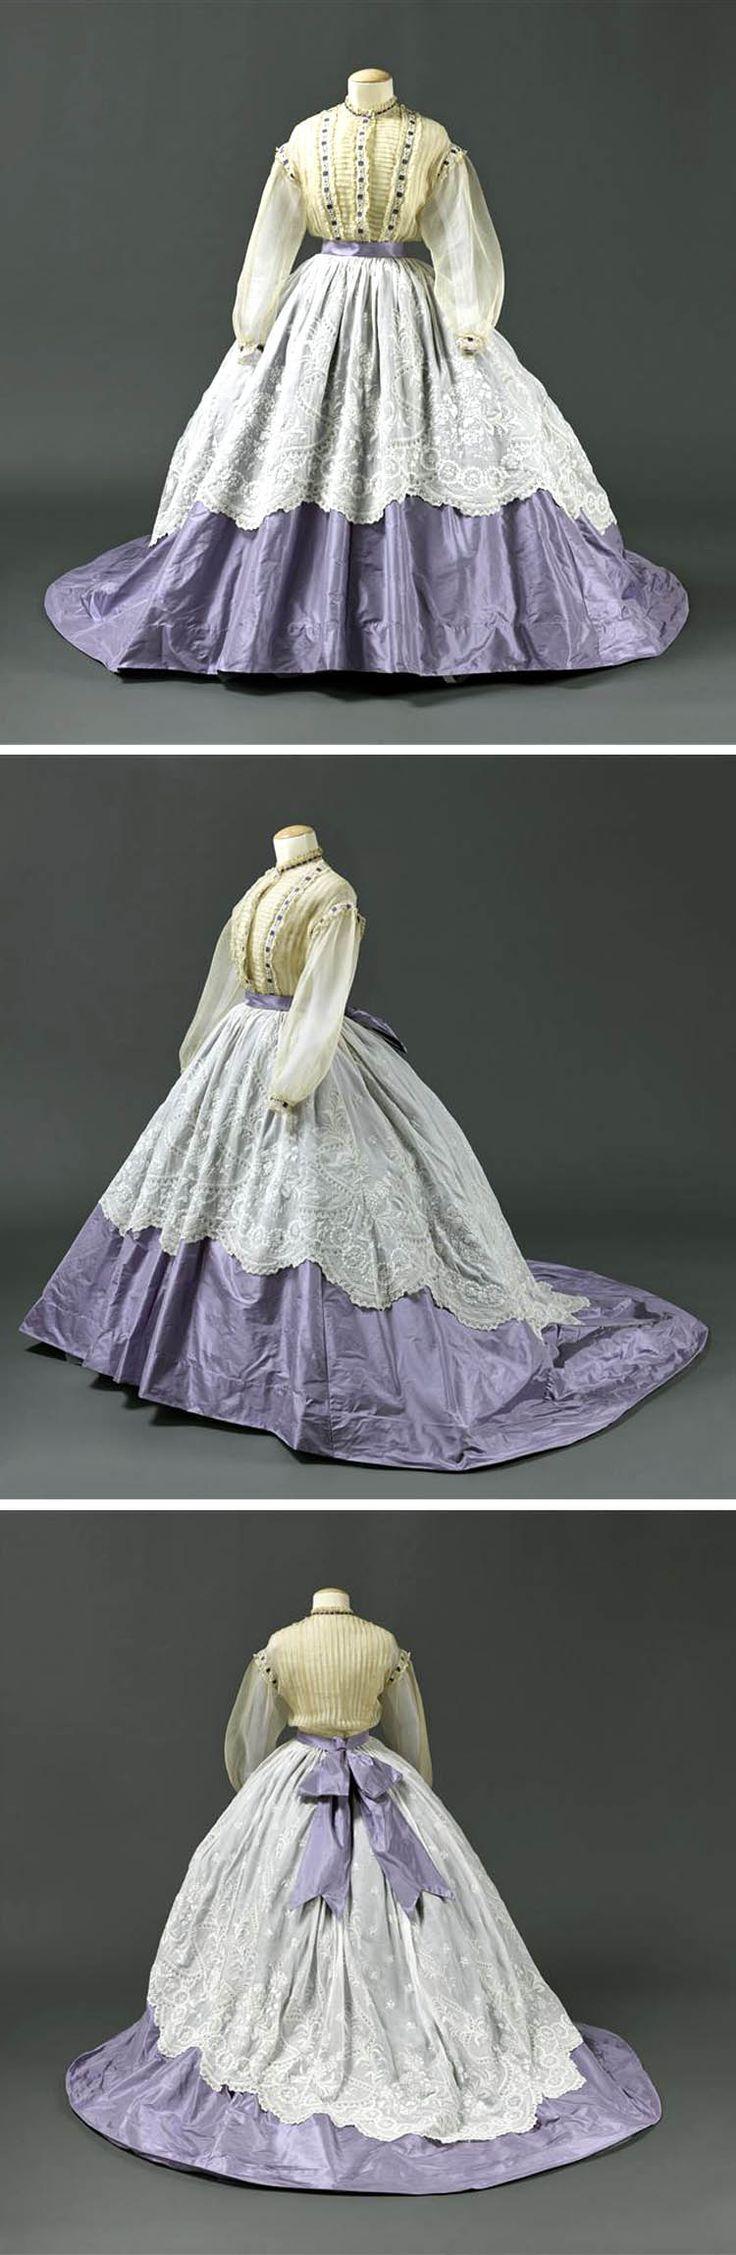 Taffeta skirt, embroidered muslin bodice, ca. 1864. Owned by Princess Mathile. Photo: RMN /Stéphane Maréchalle© Réunion des Musées Nationaux